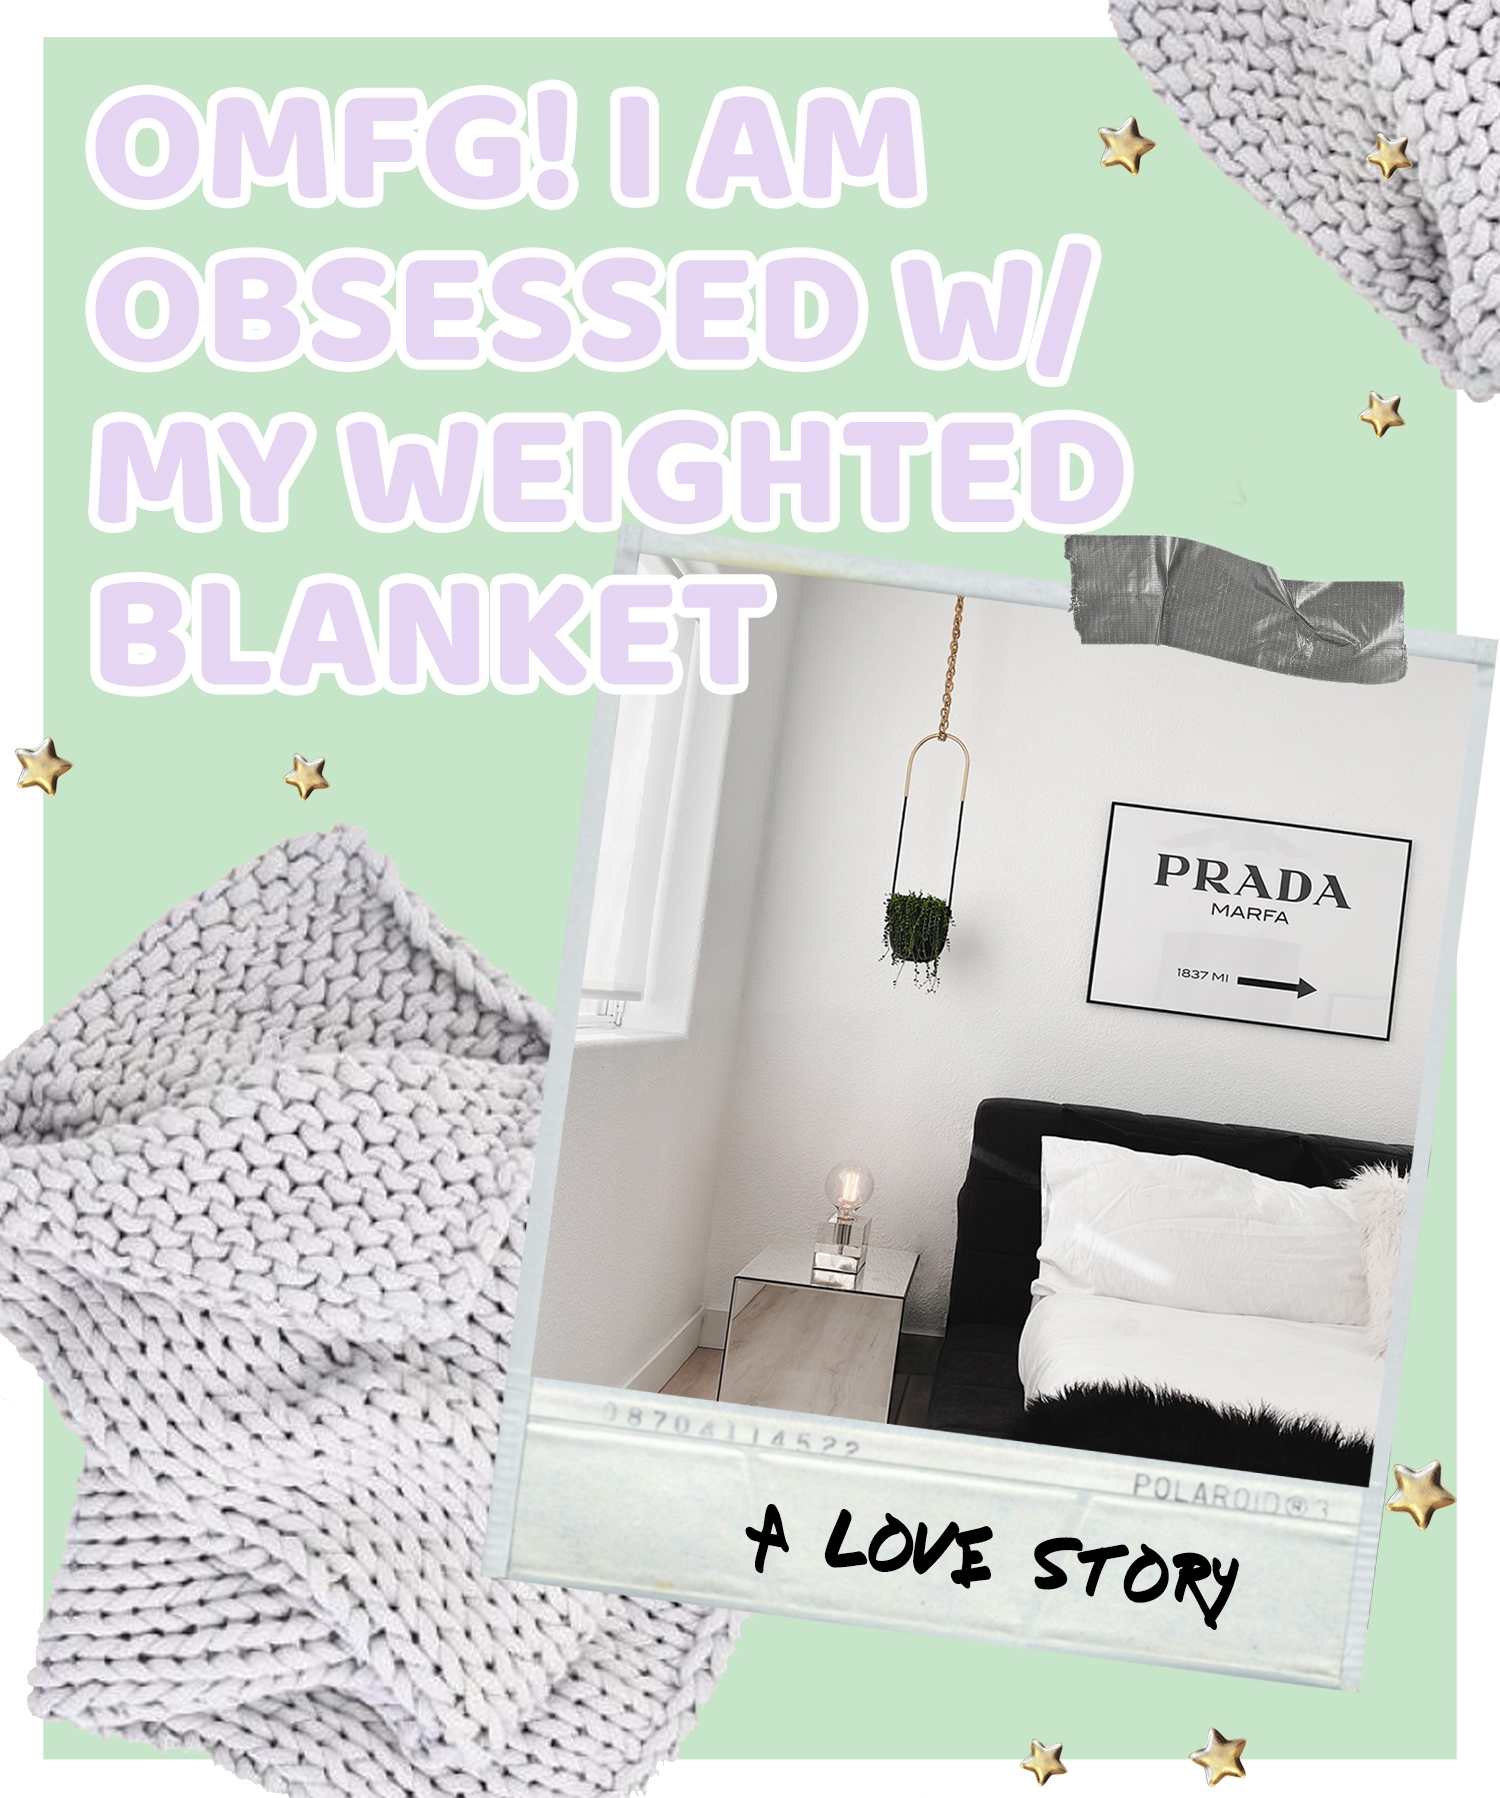 fashionlush, sleep, weighted blanket